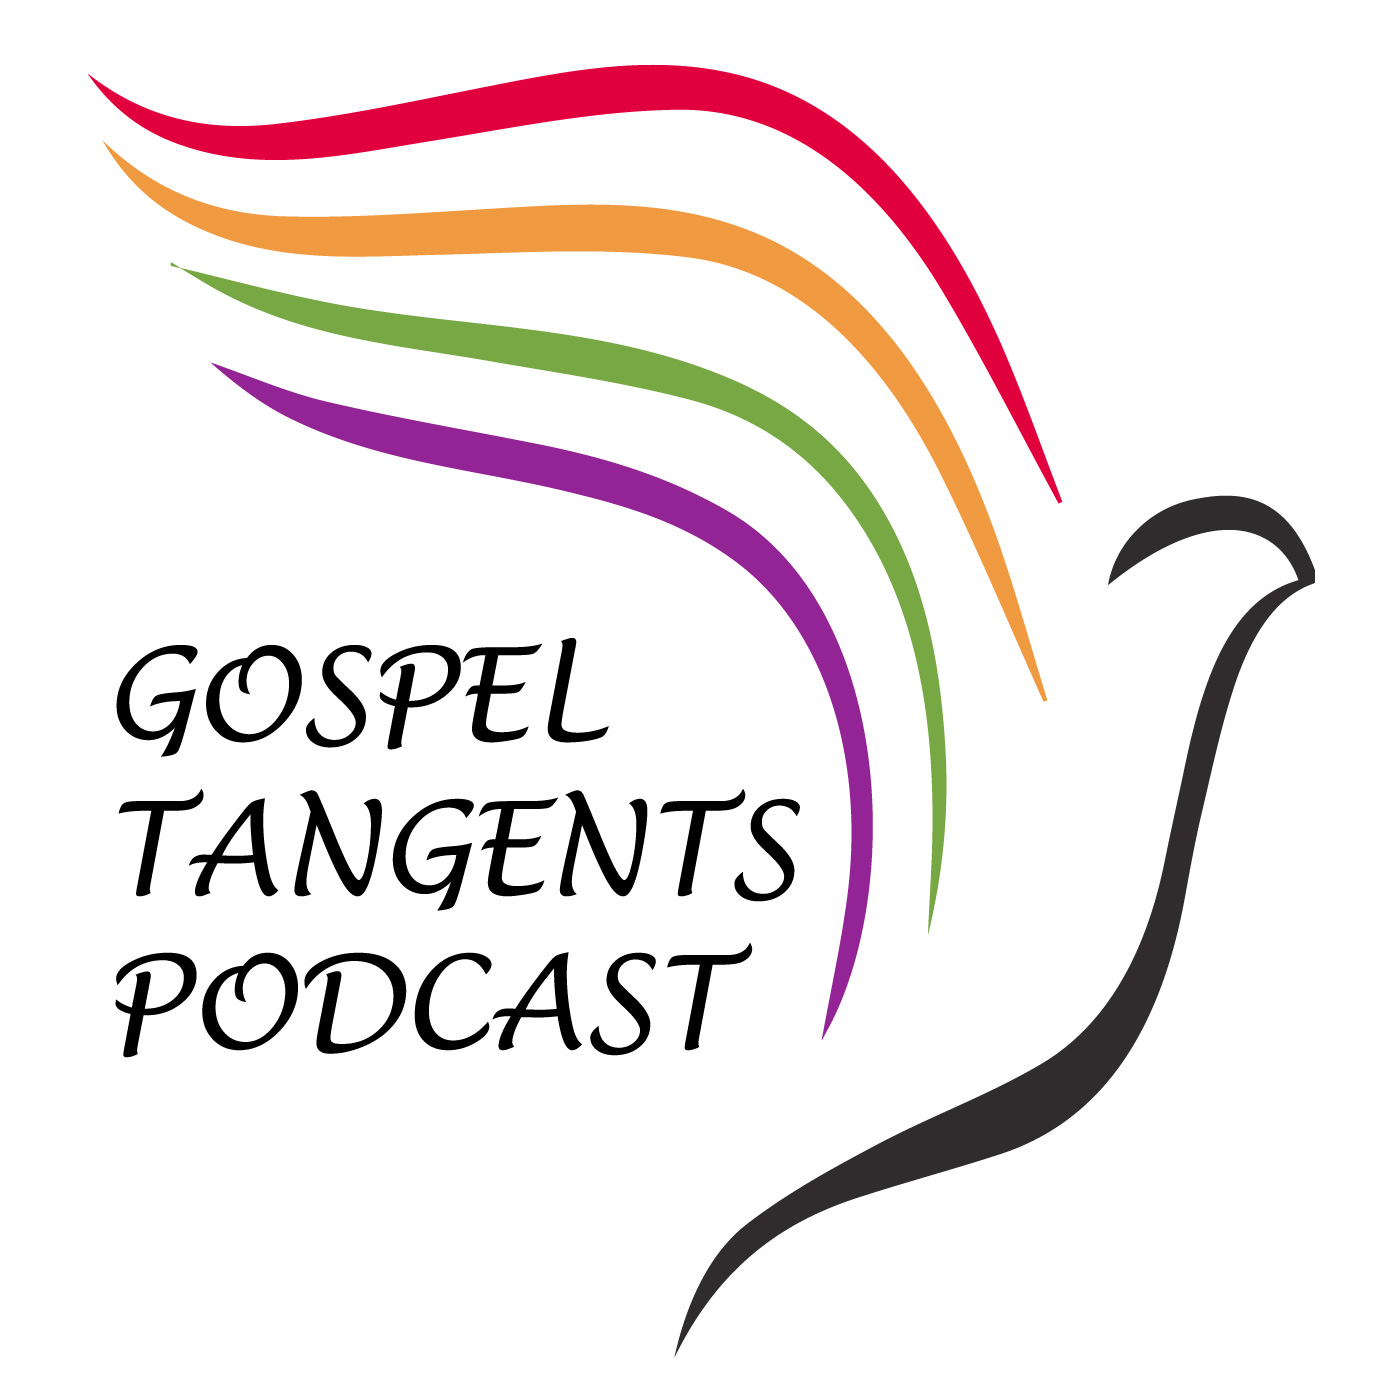 Gospel Tangents Podcast